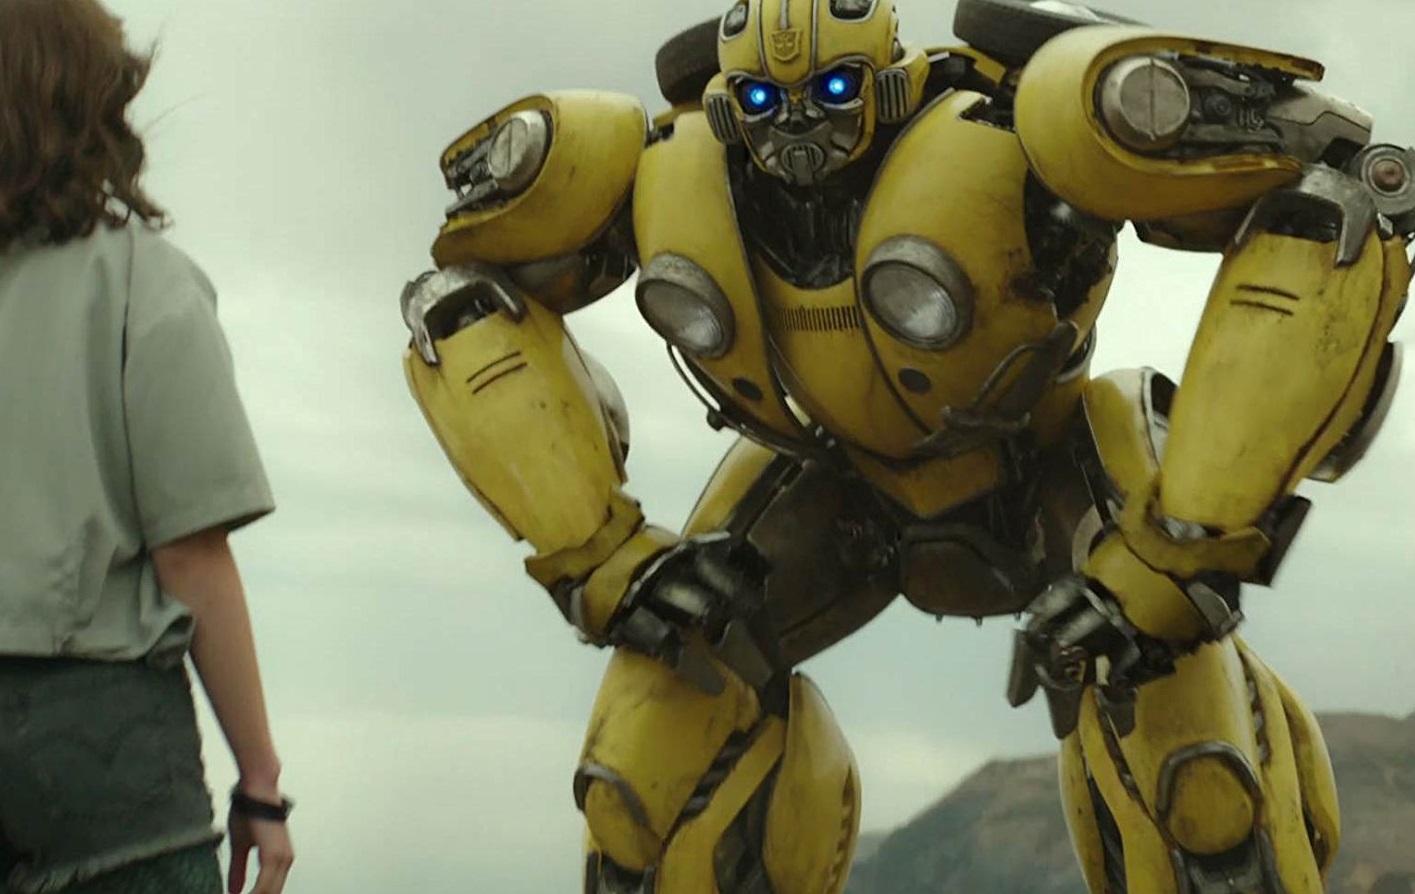 szmk_transformers_decepticon_autobot_bumblebee_urdongo_optimus_prime_5.jpg